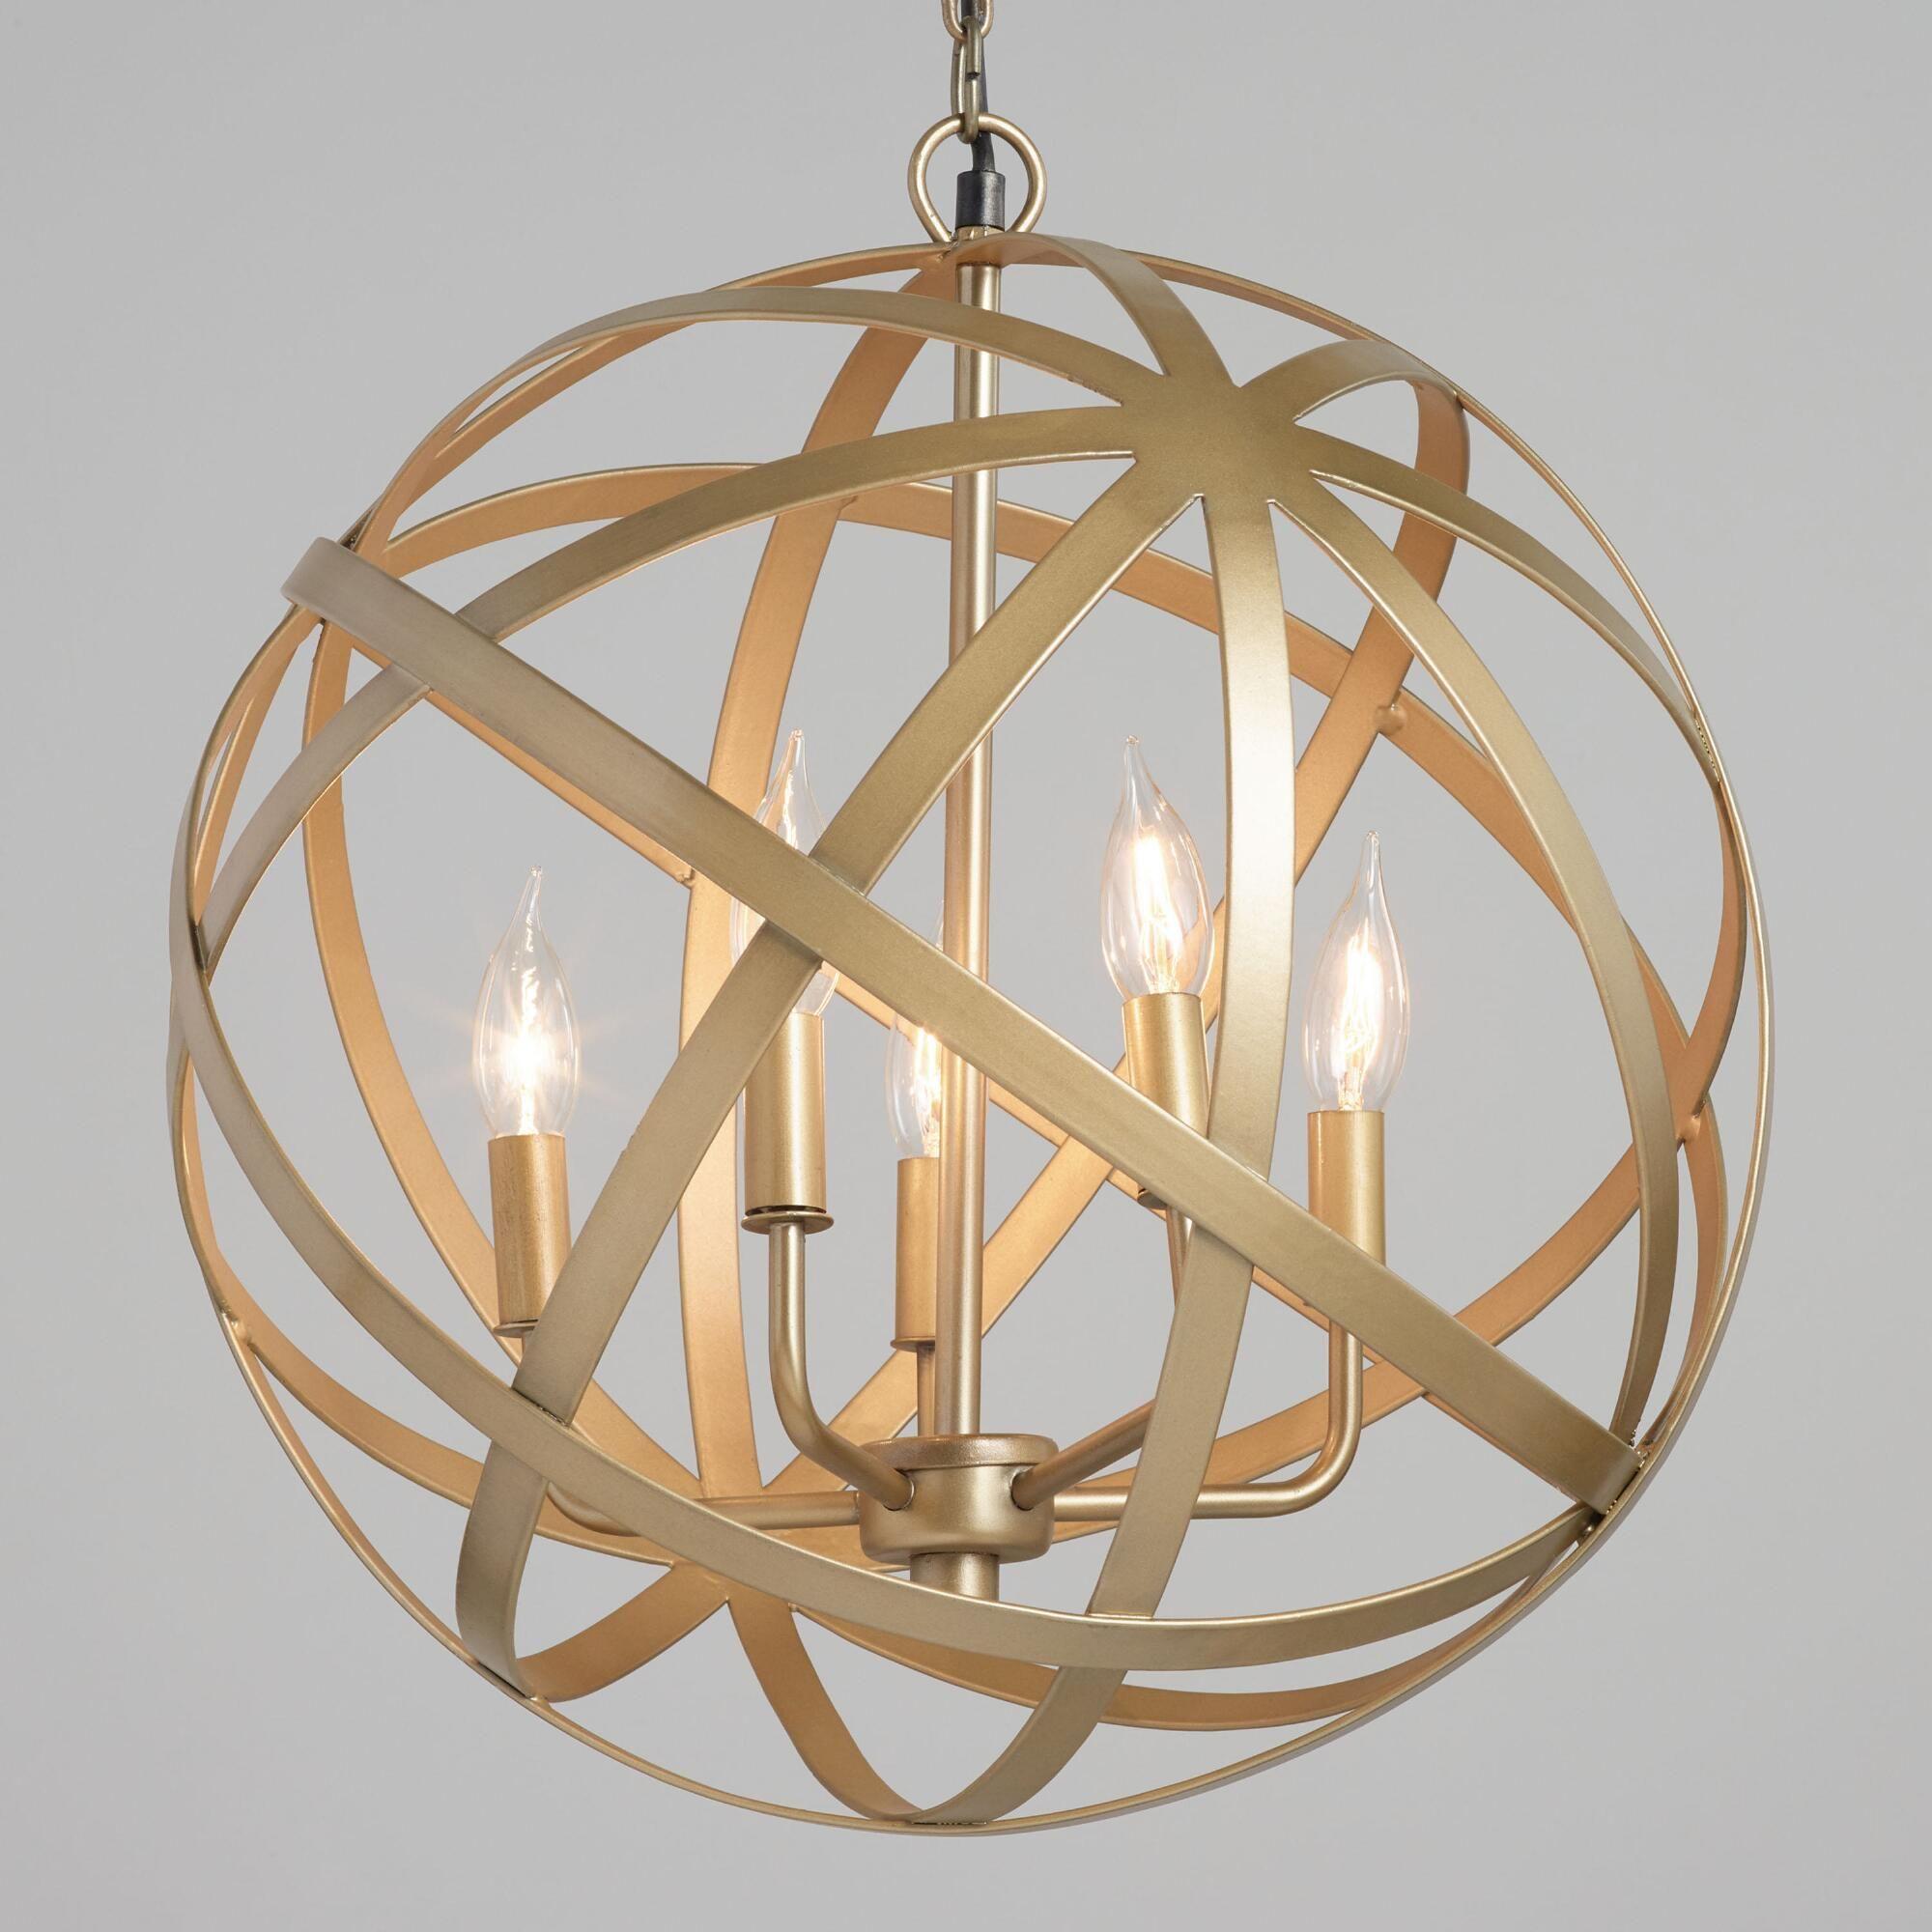 Antique Brass Orb 5 Light Chandelier By World Market